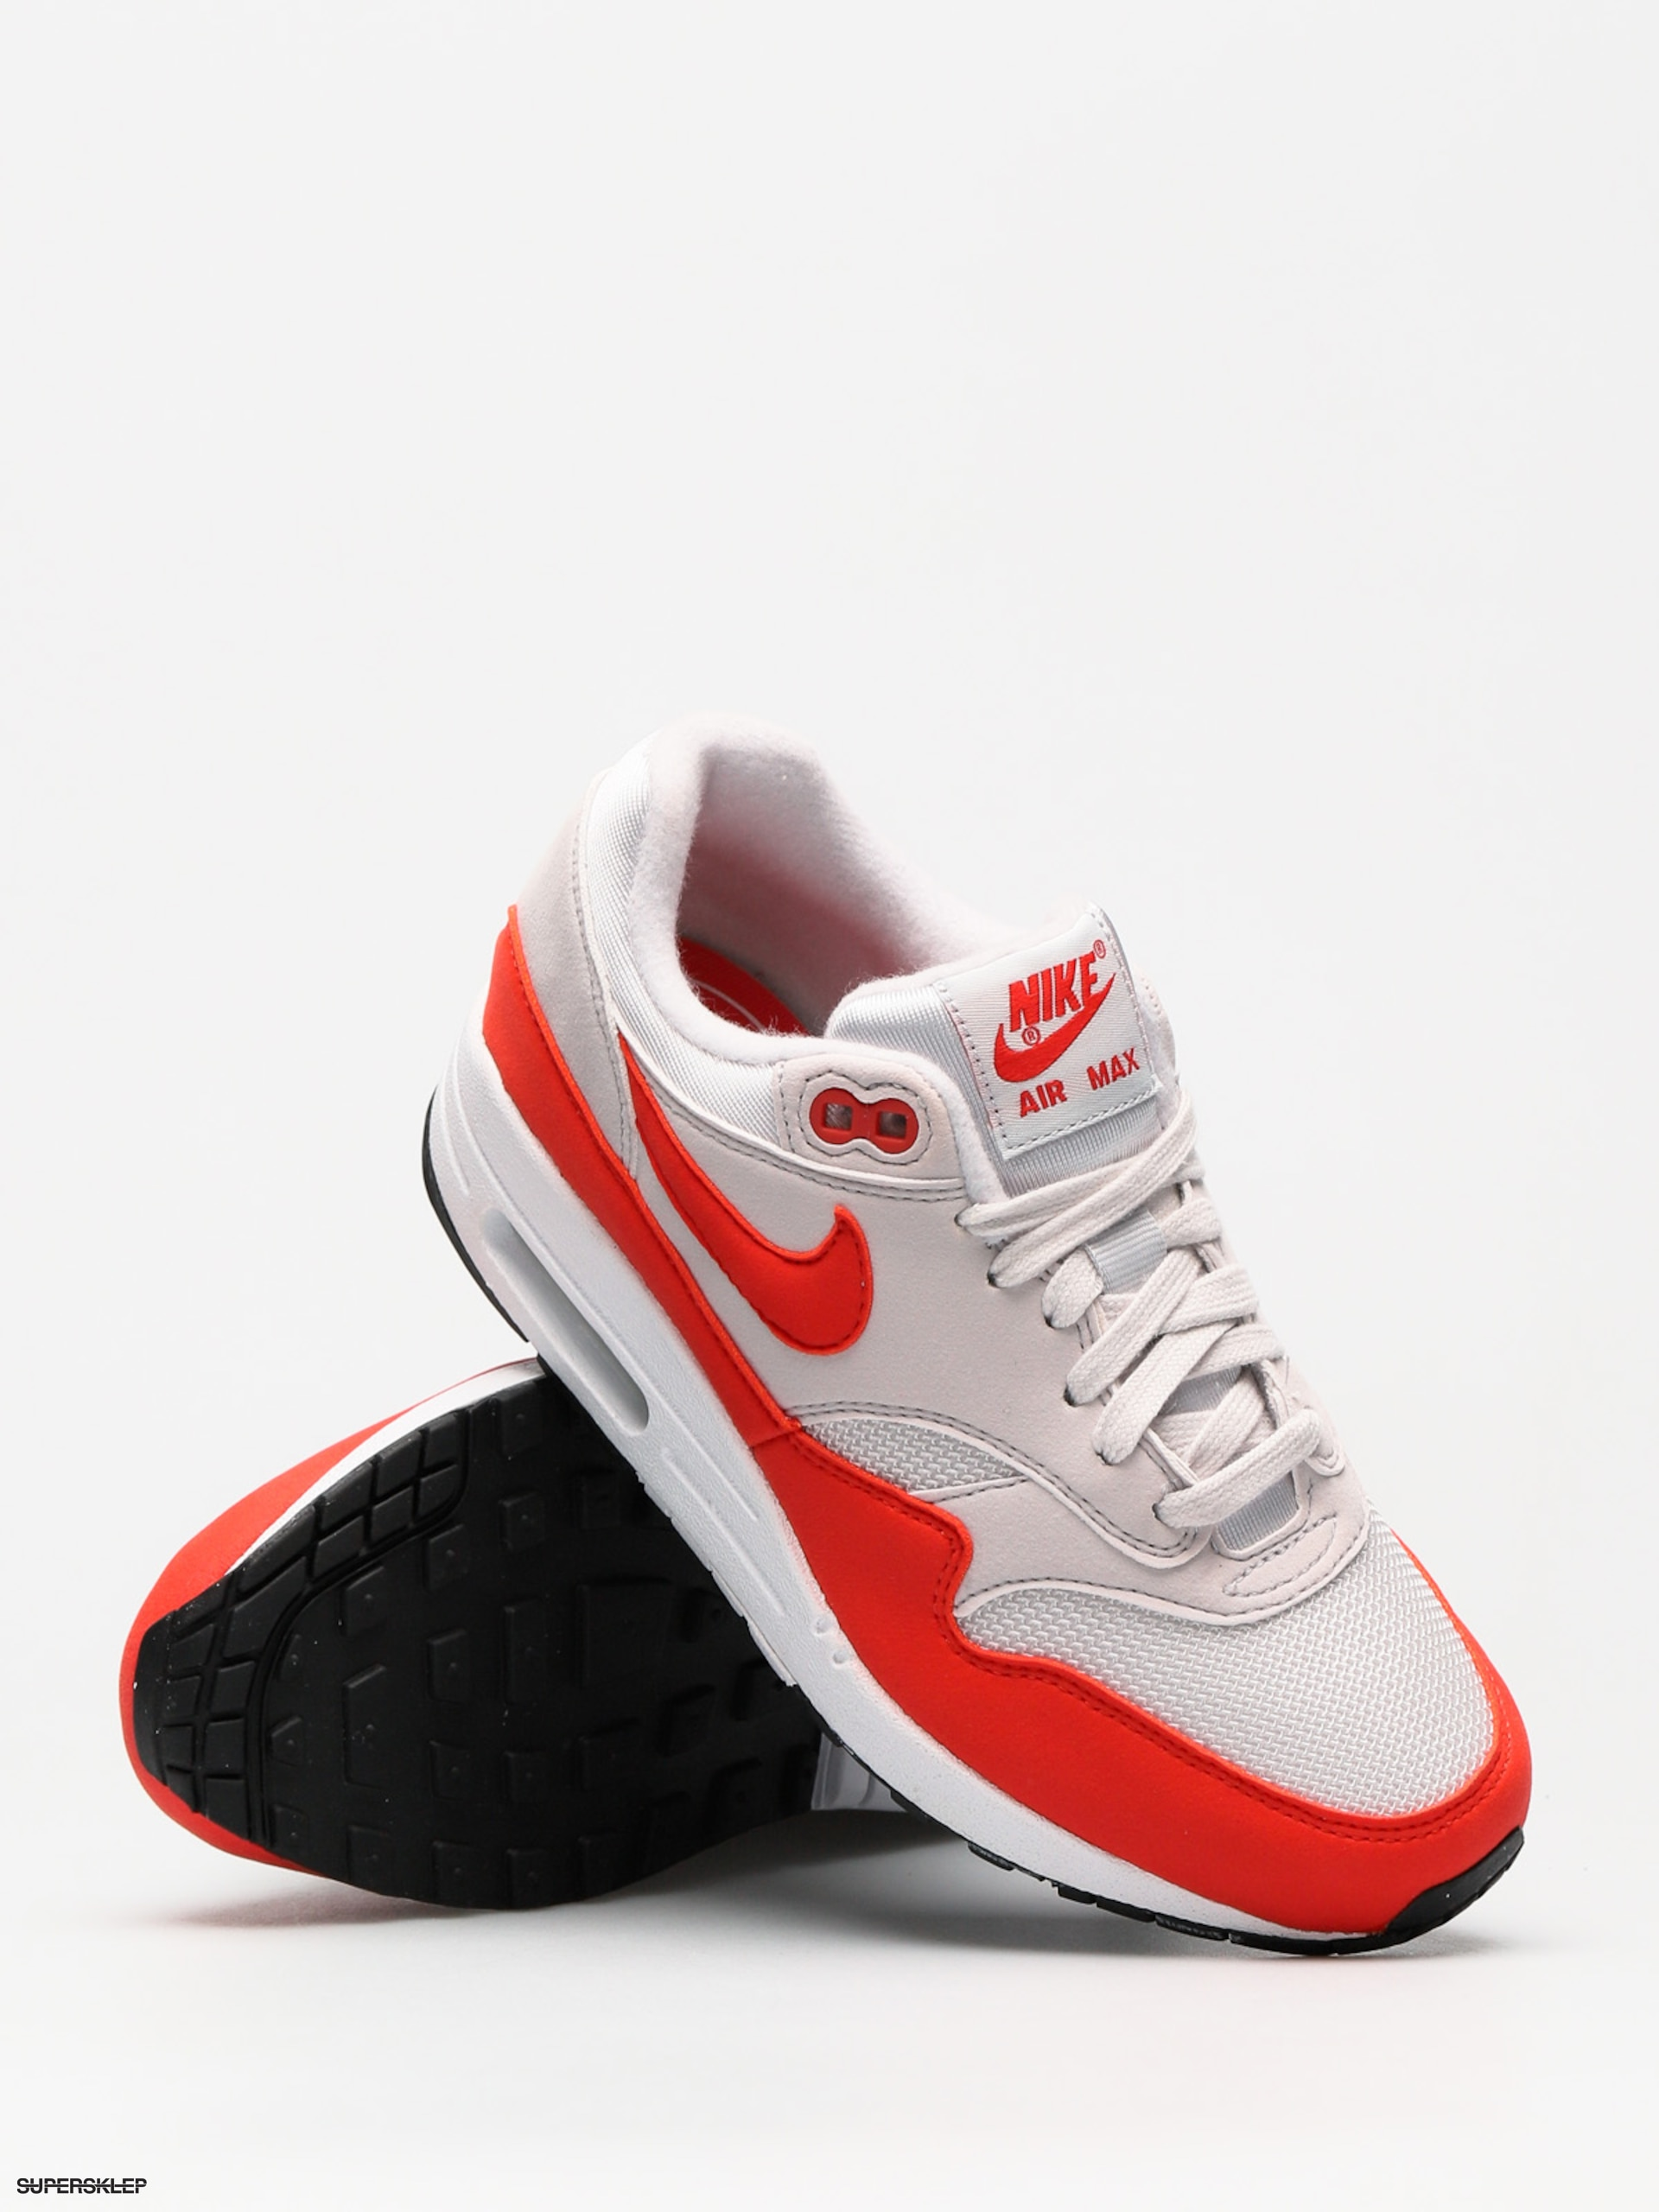 Nike Air Max 95 SE Shoe vast grey midnight navy habanero red